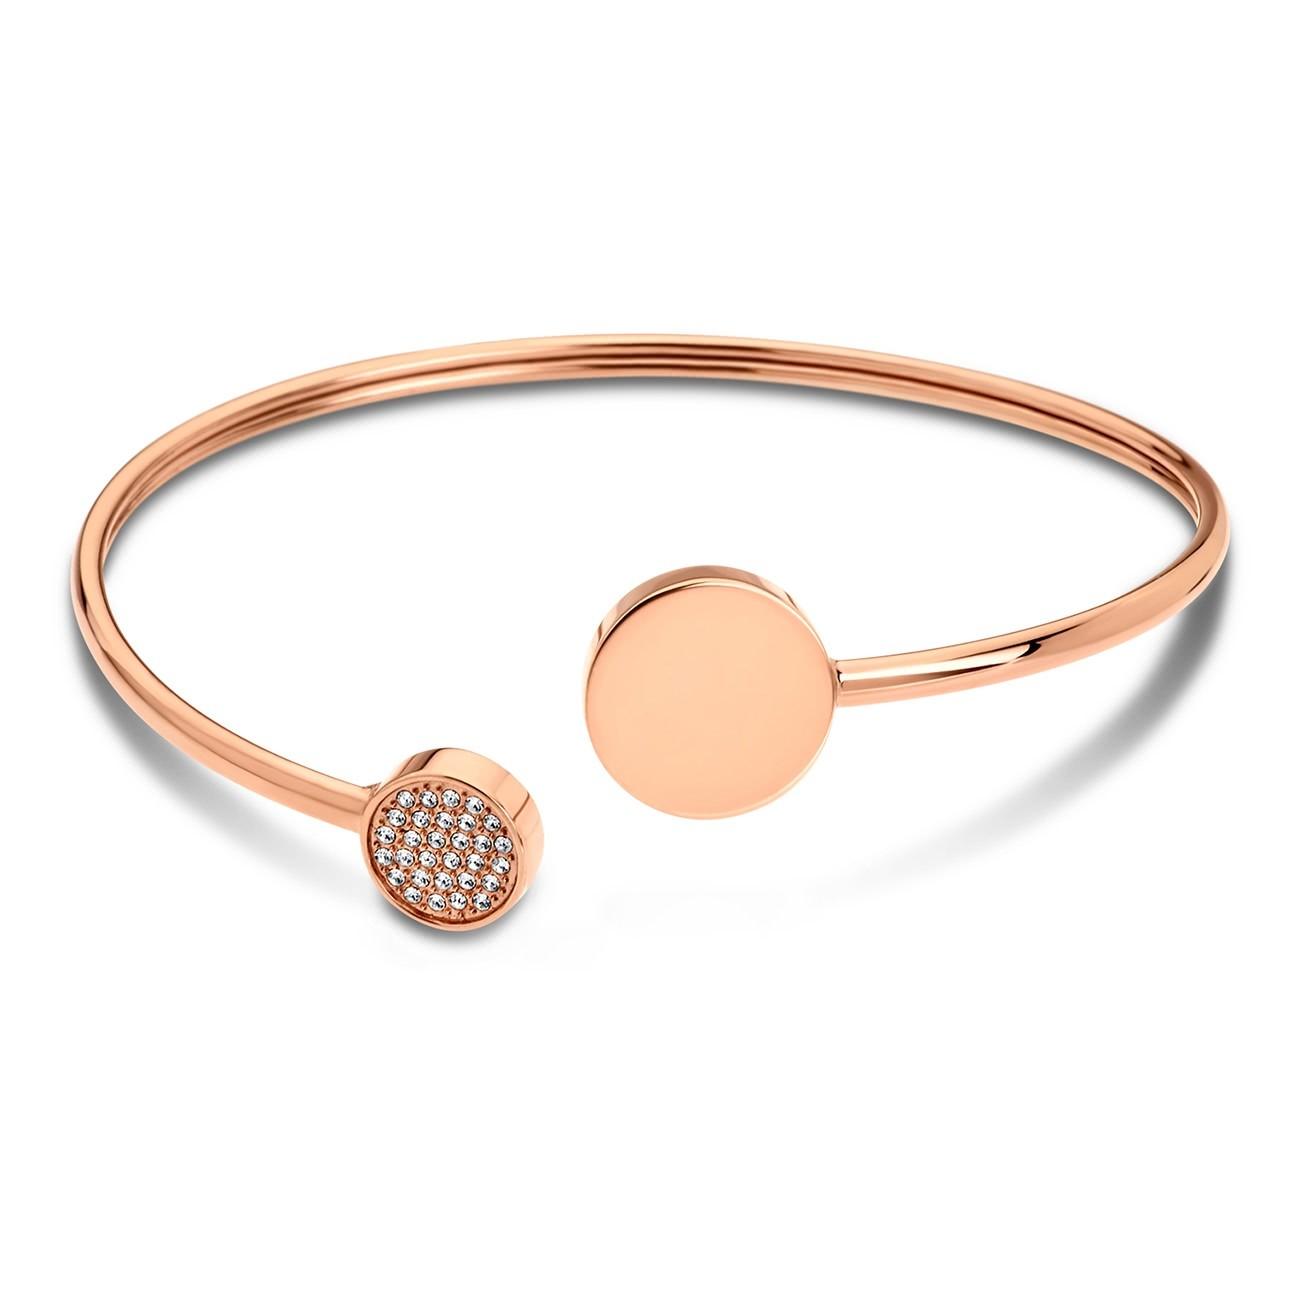 LOTUS Style Armband Damen Armreif LS1819-2/2 Edelstahl roségold JLS1819-2-2